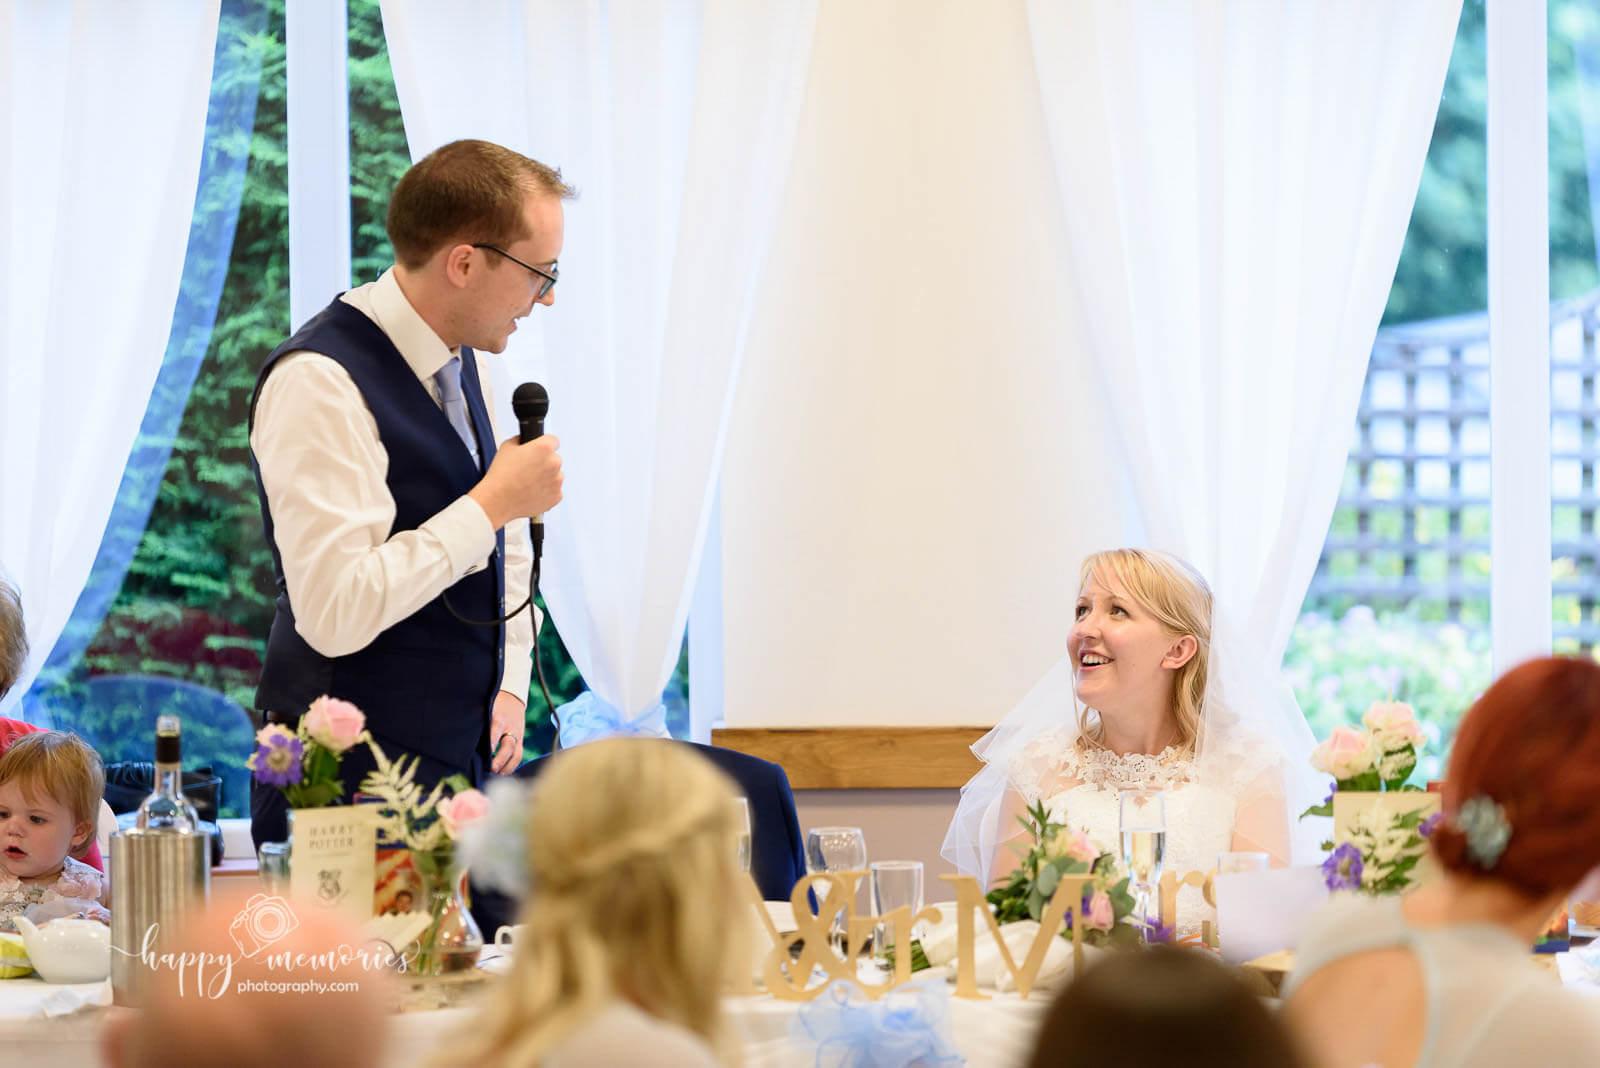 Wedding photographer East Grinstead-33